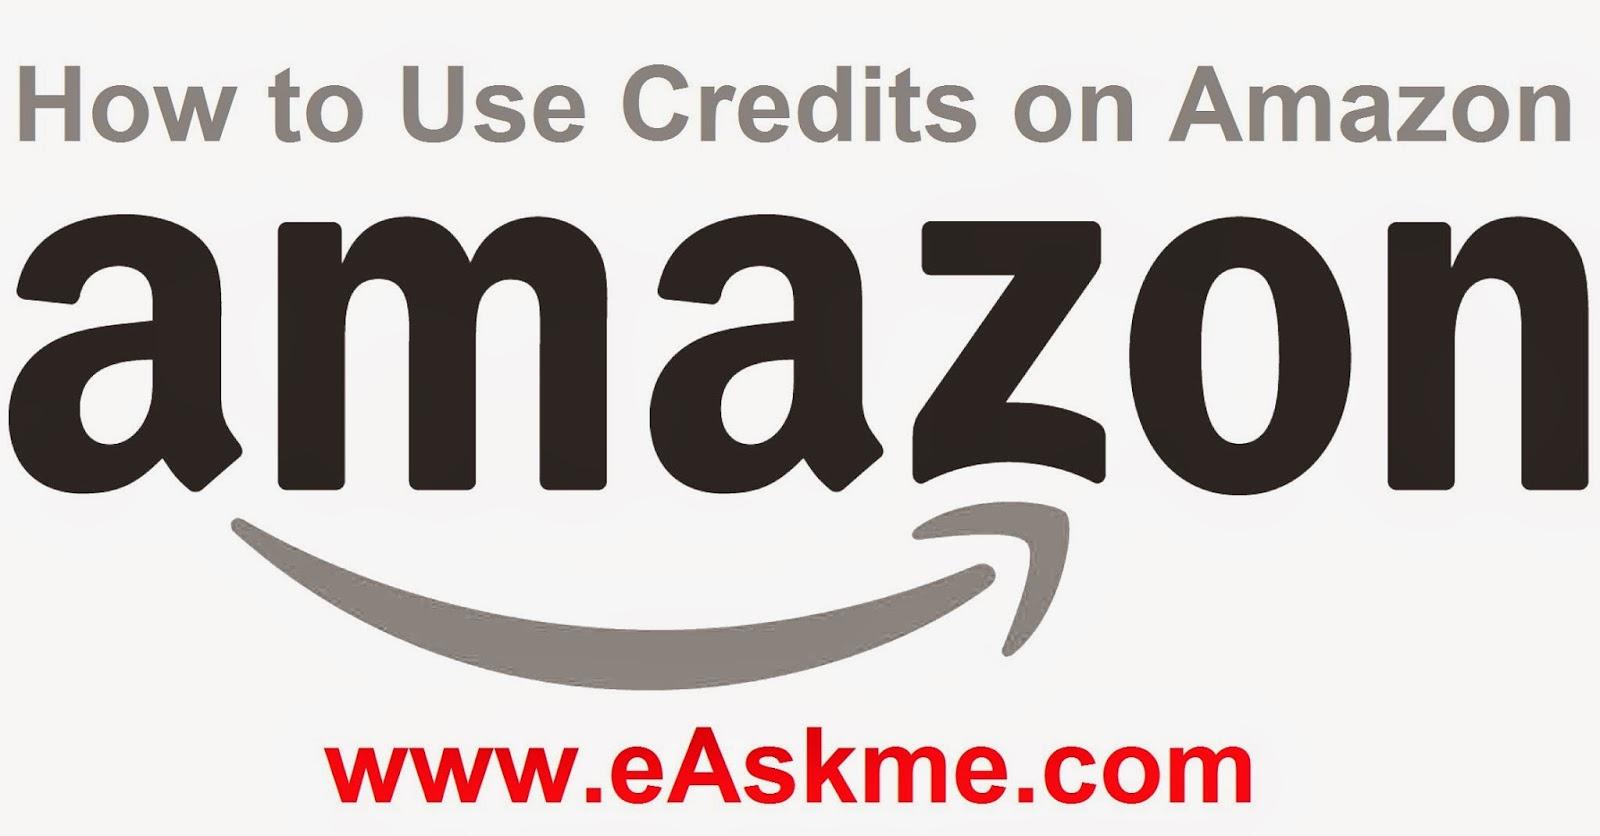 How to Use Credits on Amazon : eAskme